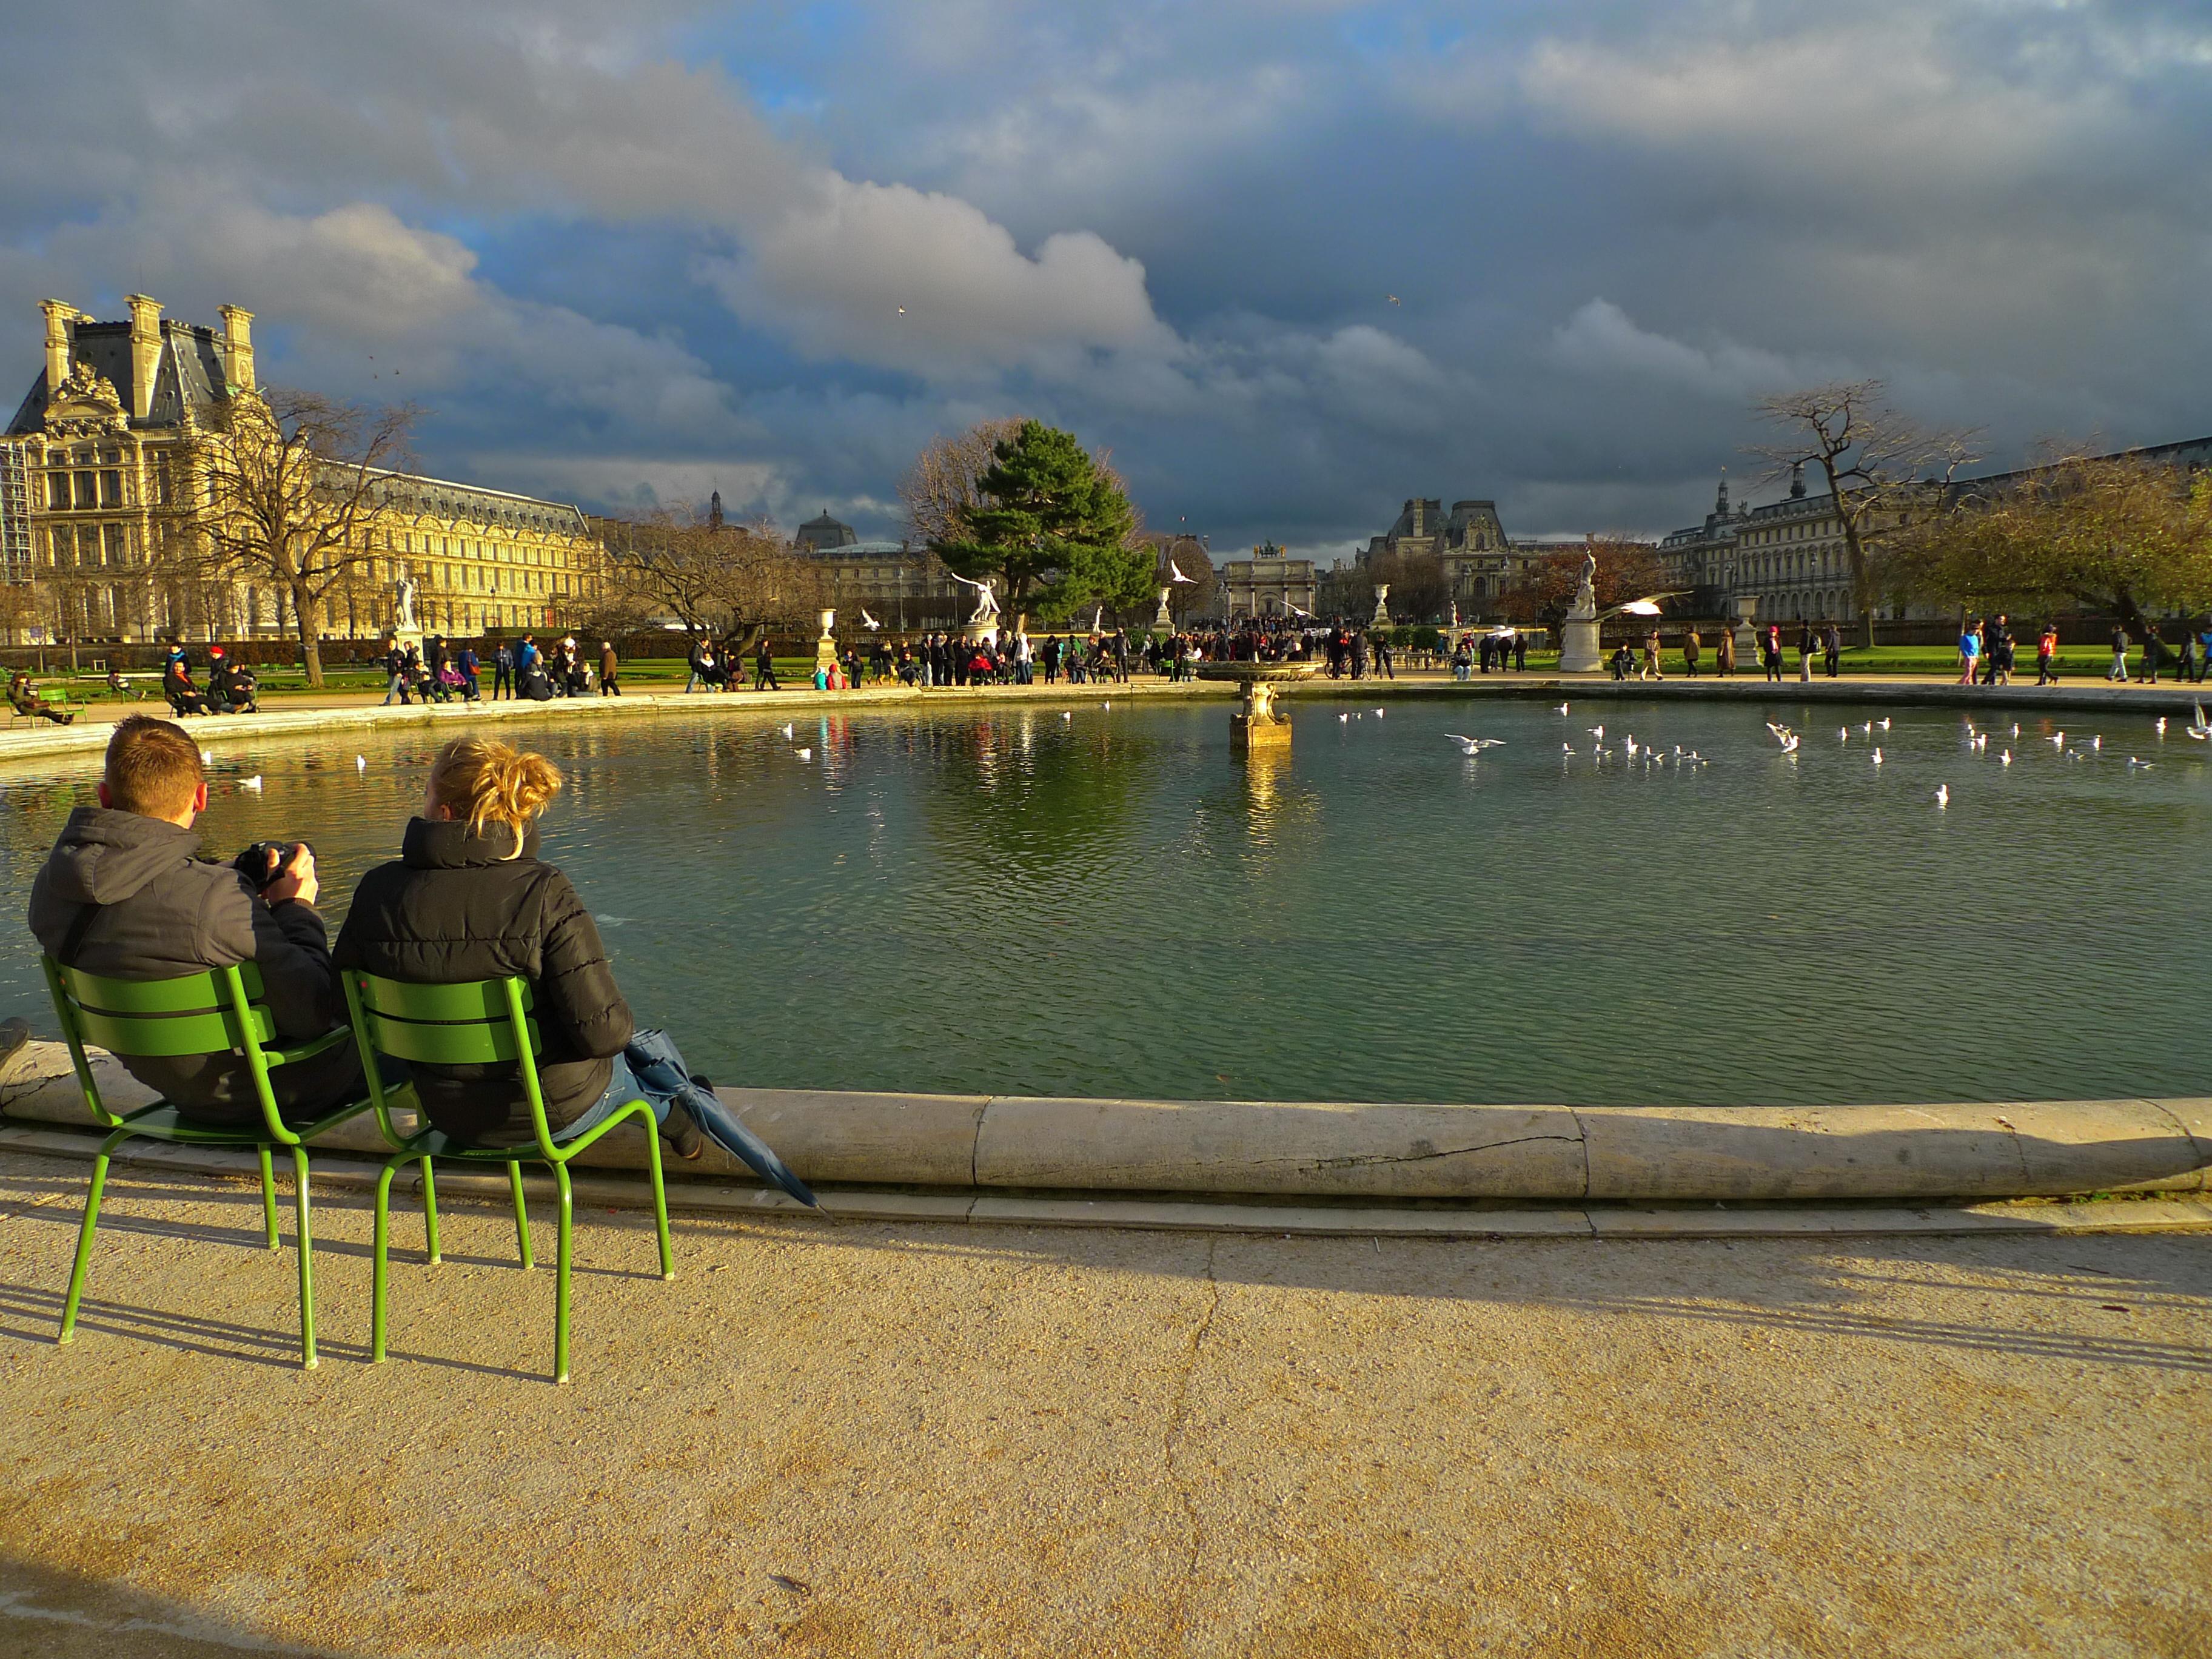 Christmas Day in the Jardin des Tuileries | Soundlandscapes\' Blog